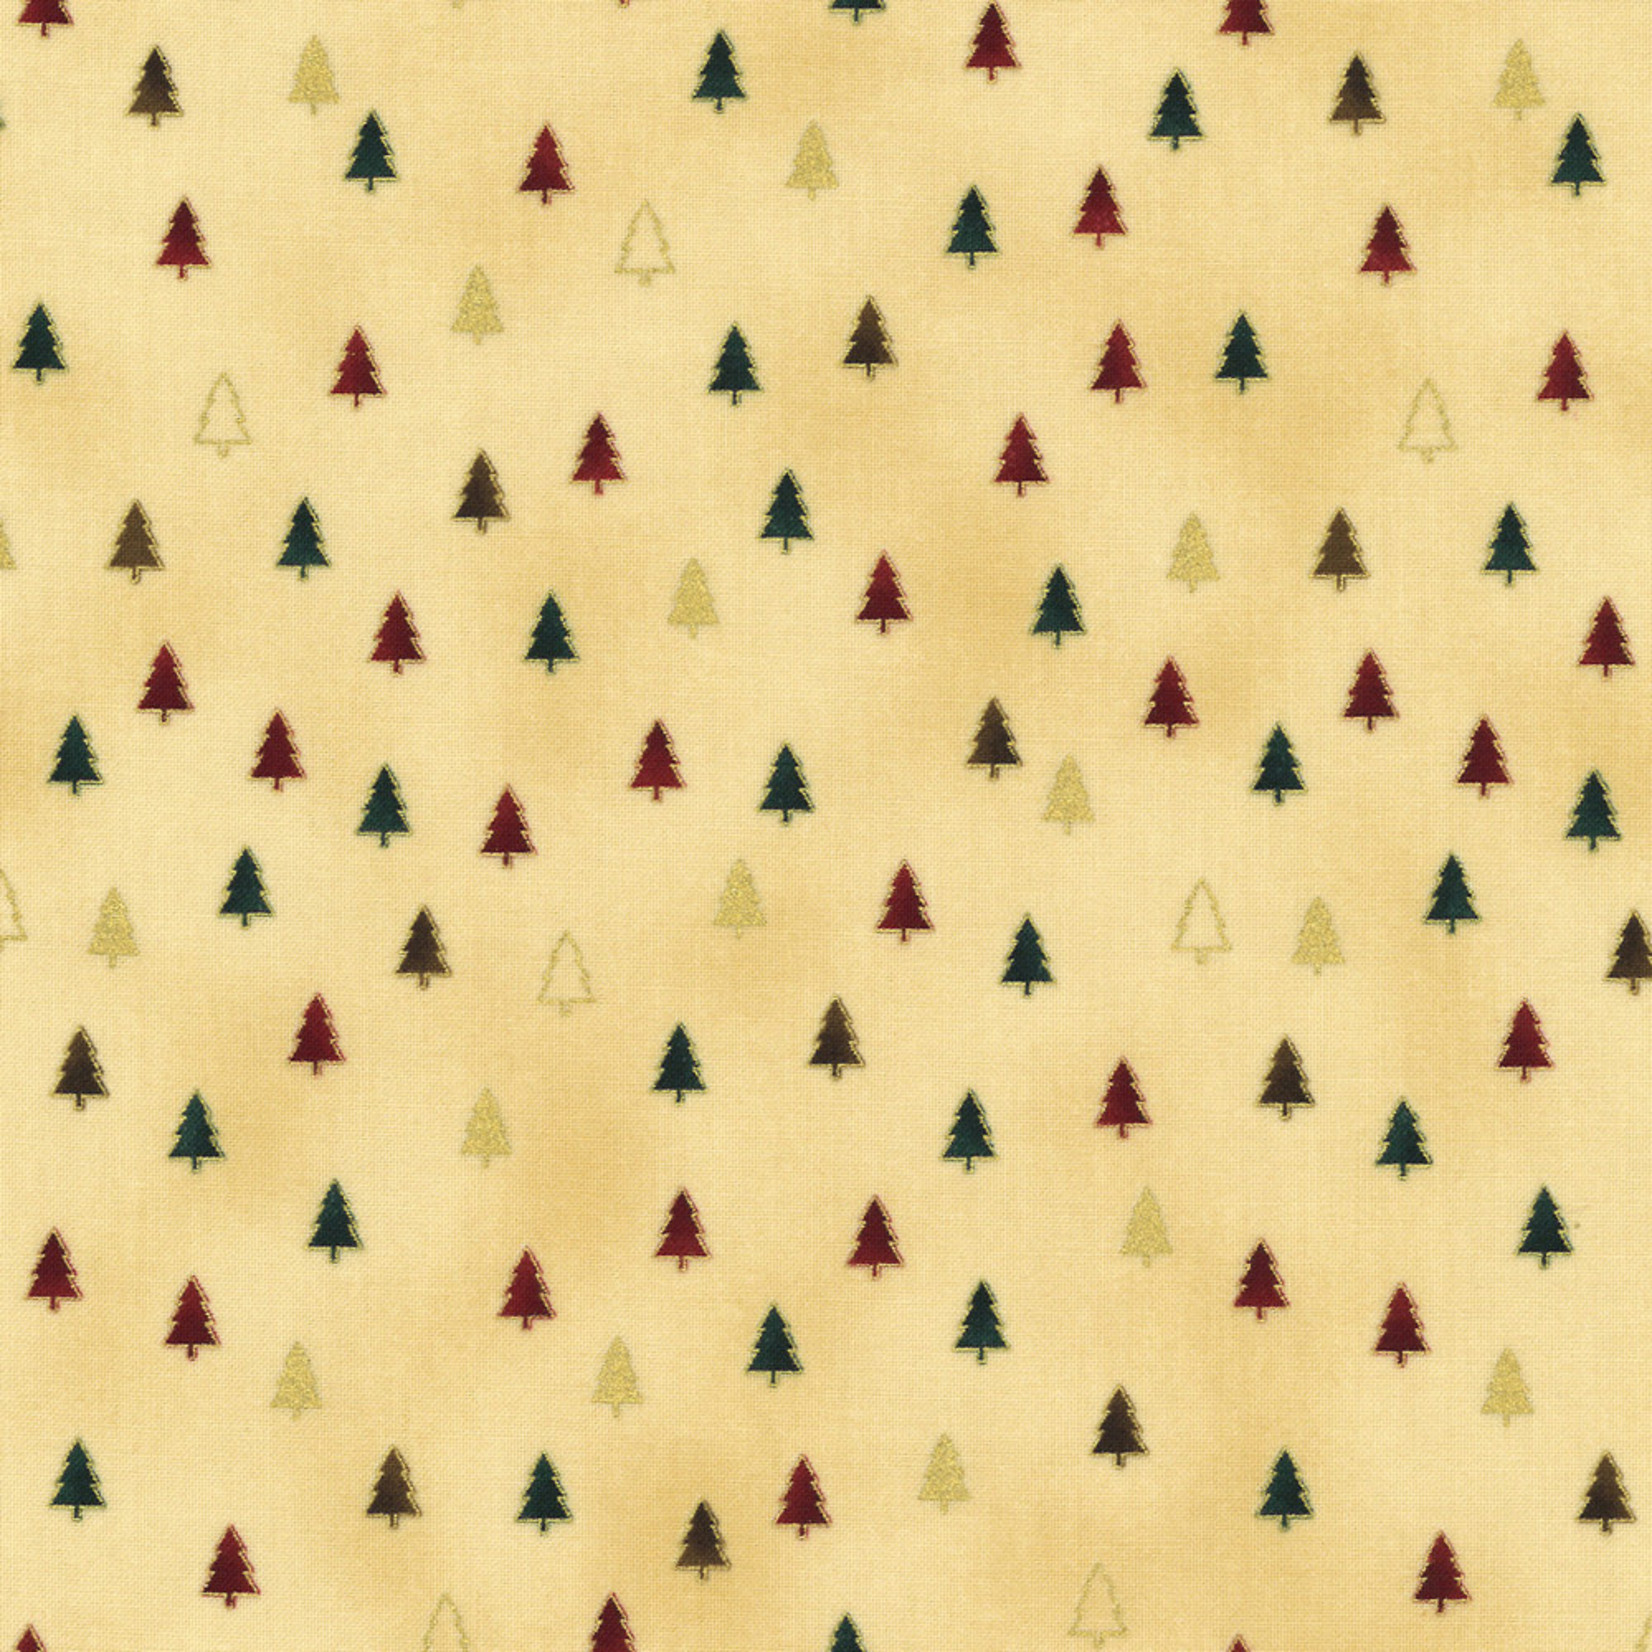 Stof Fabrics Christmas Wonders - Trees - Beige Gold